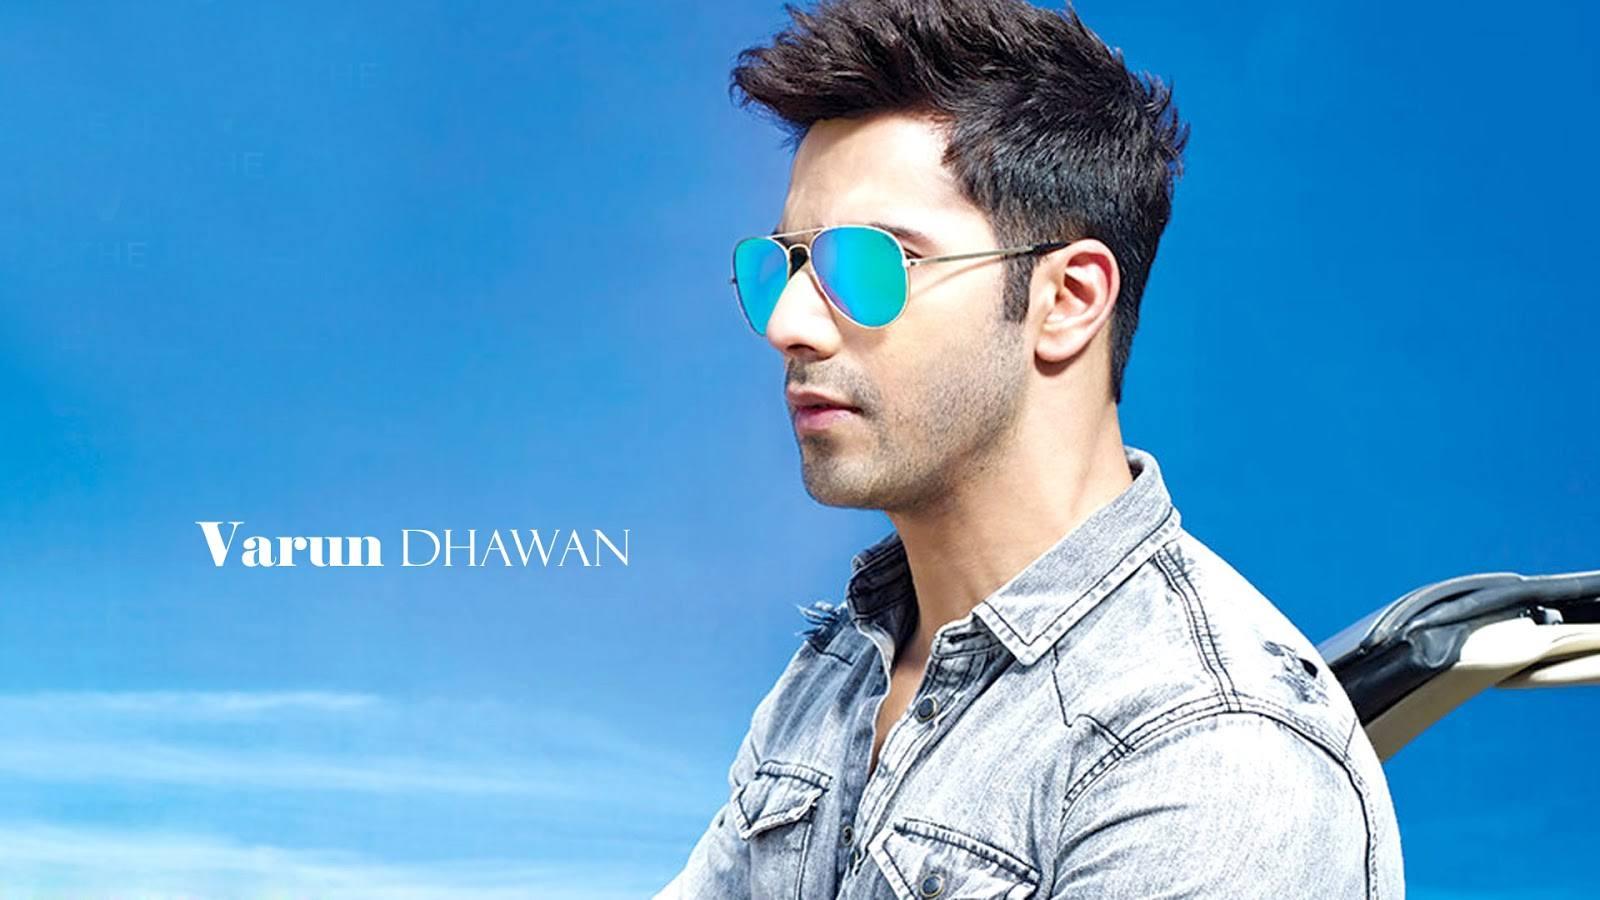 Varun Dhawan Images